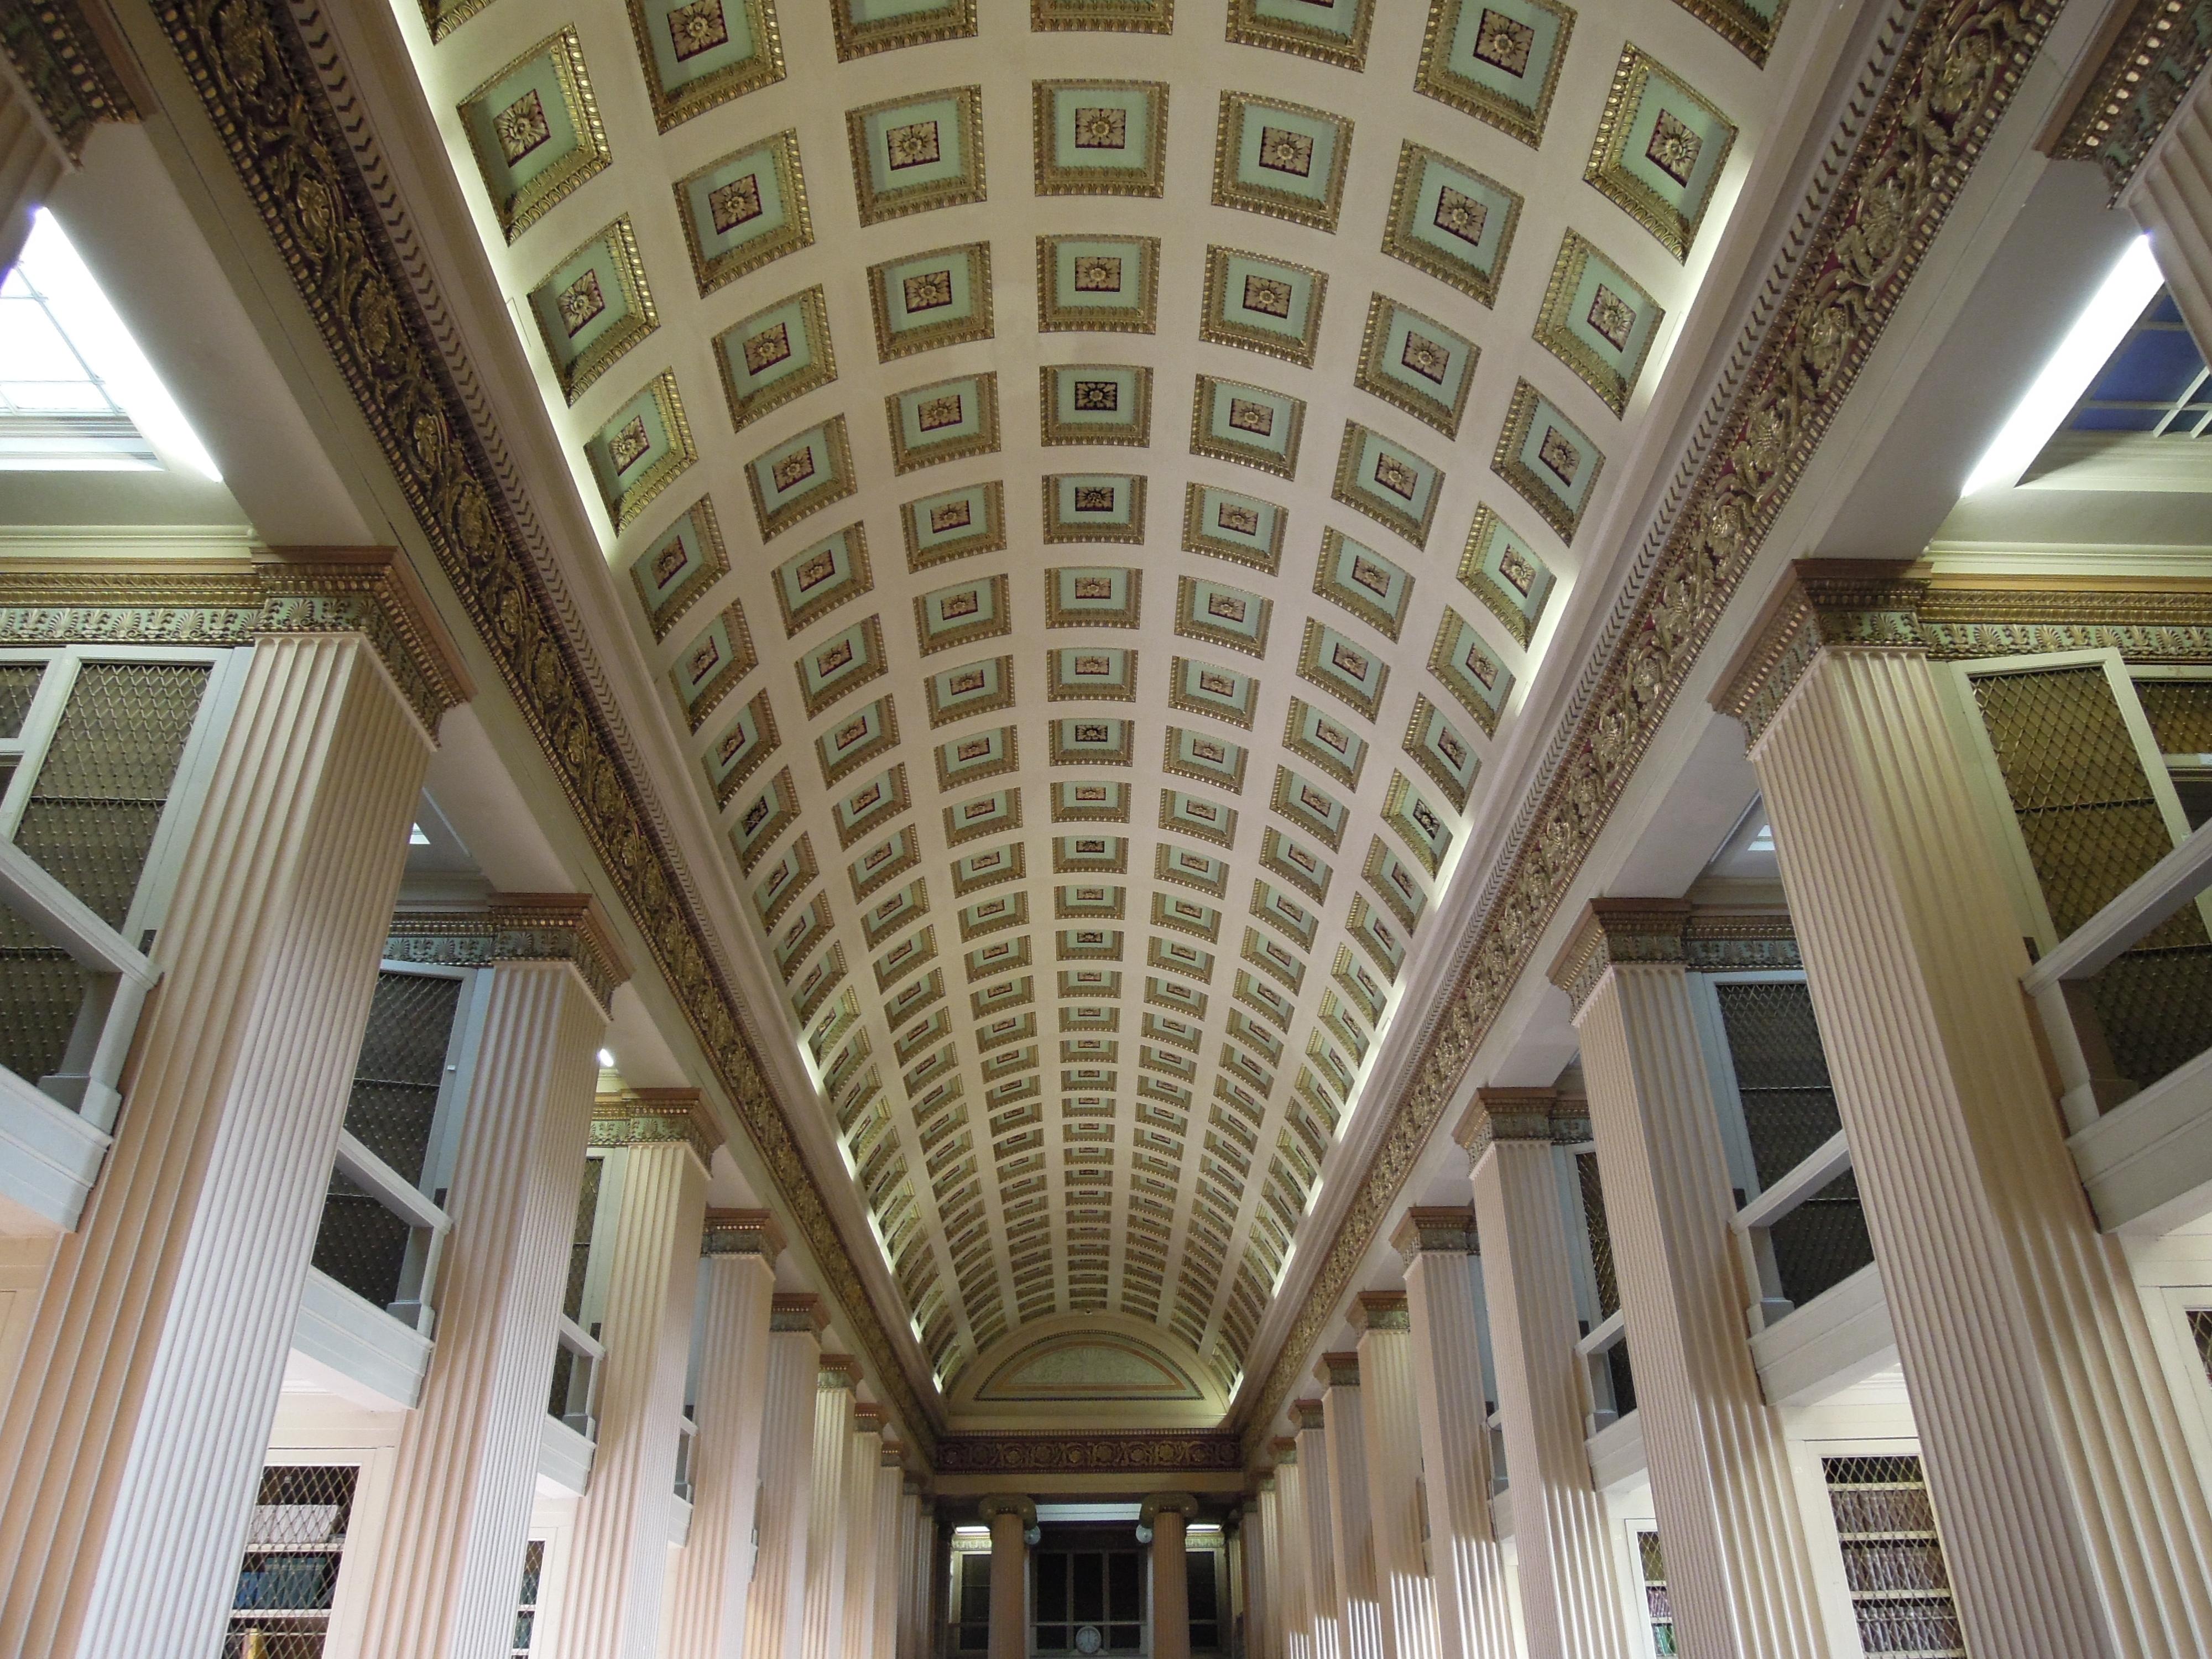 biblioteka edynburska